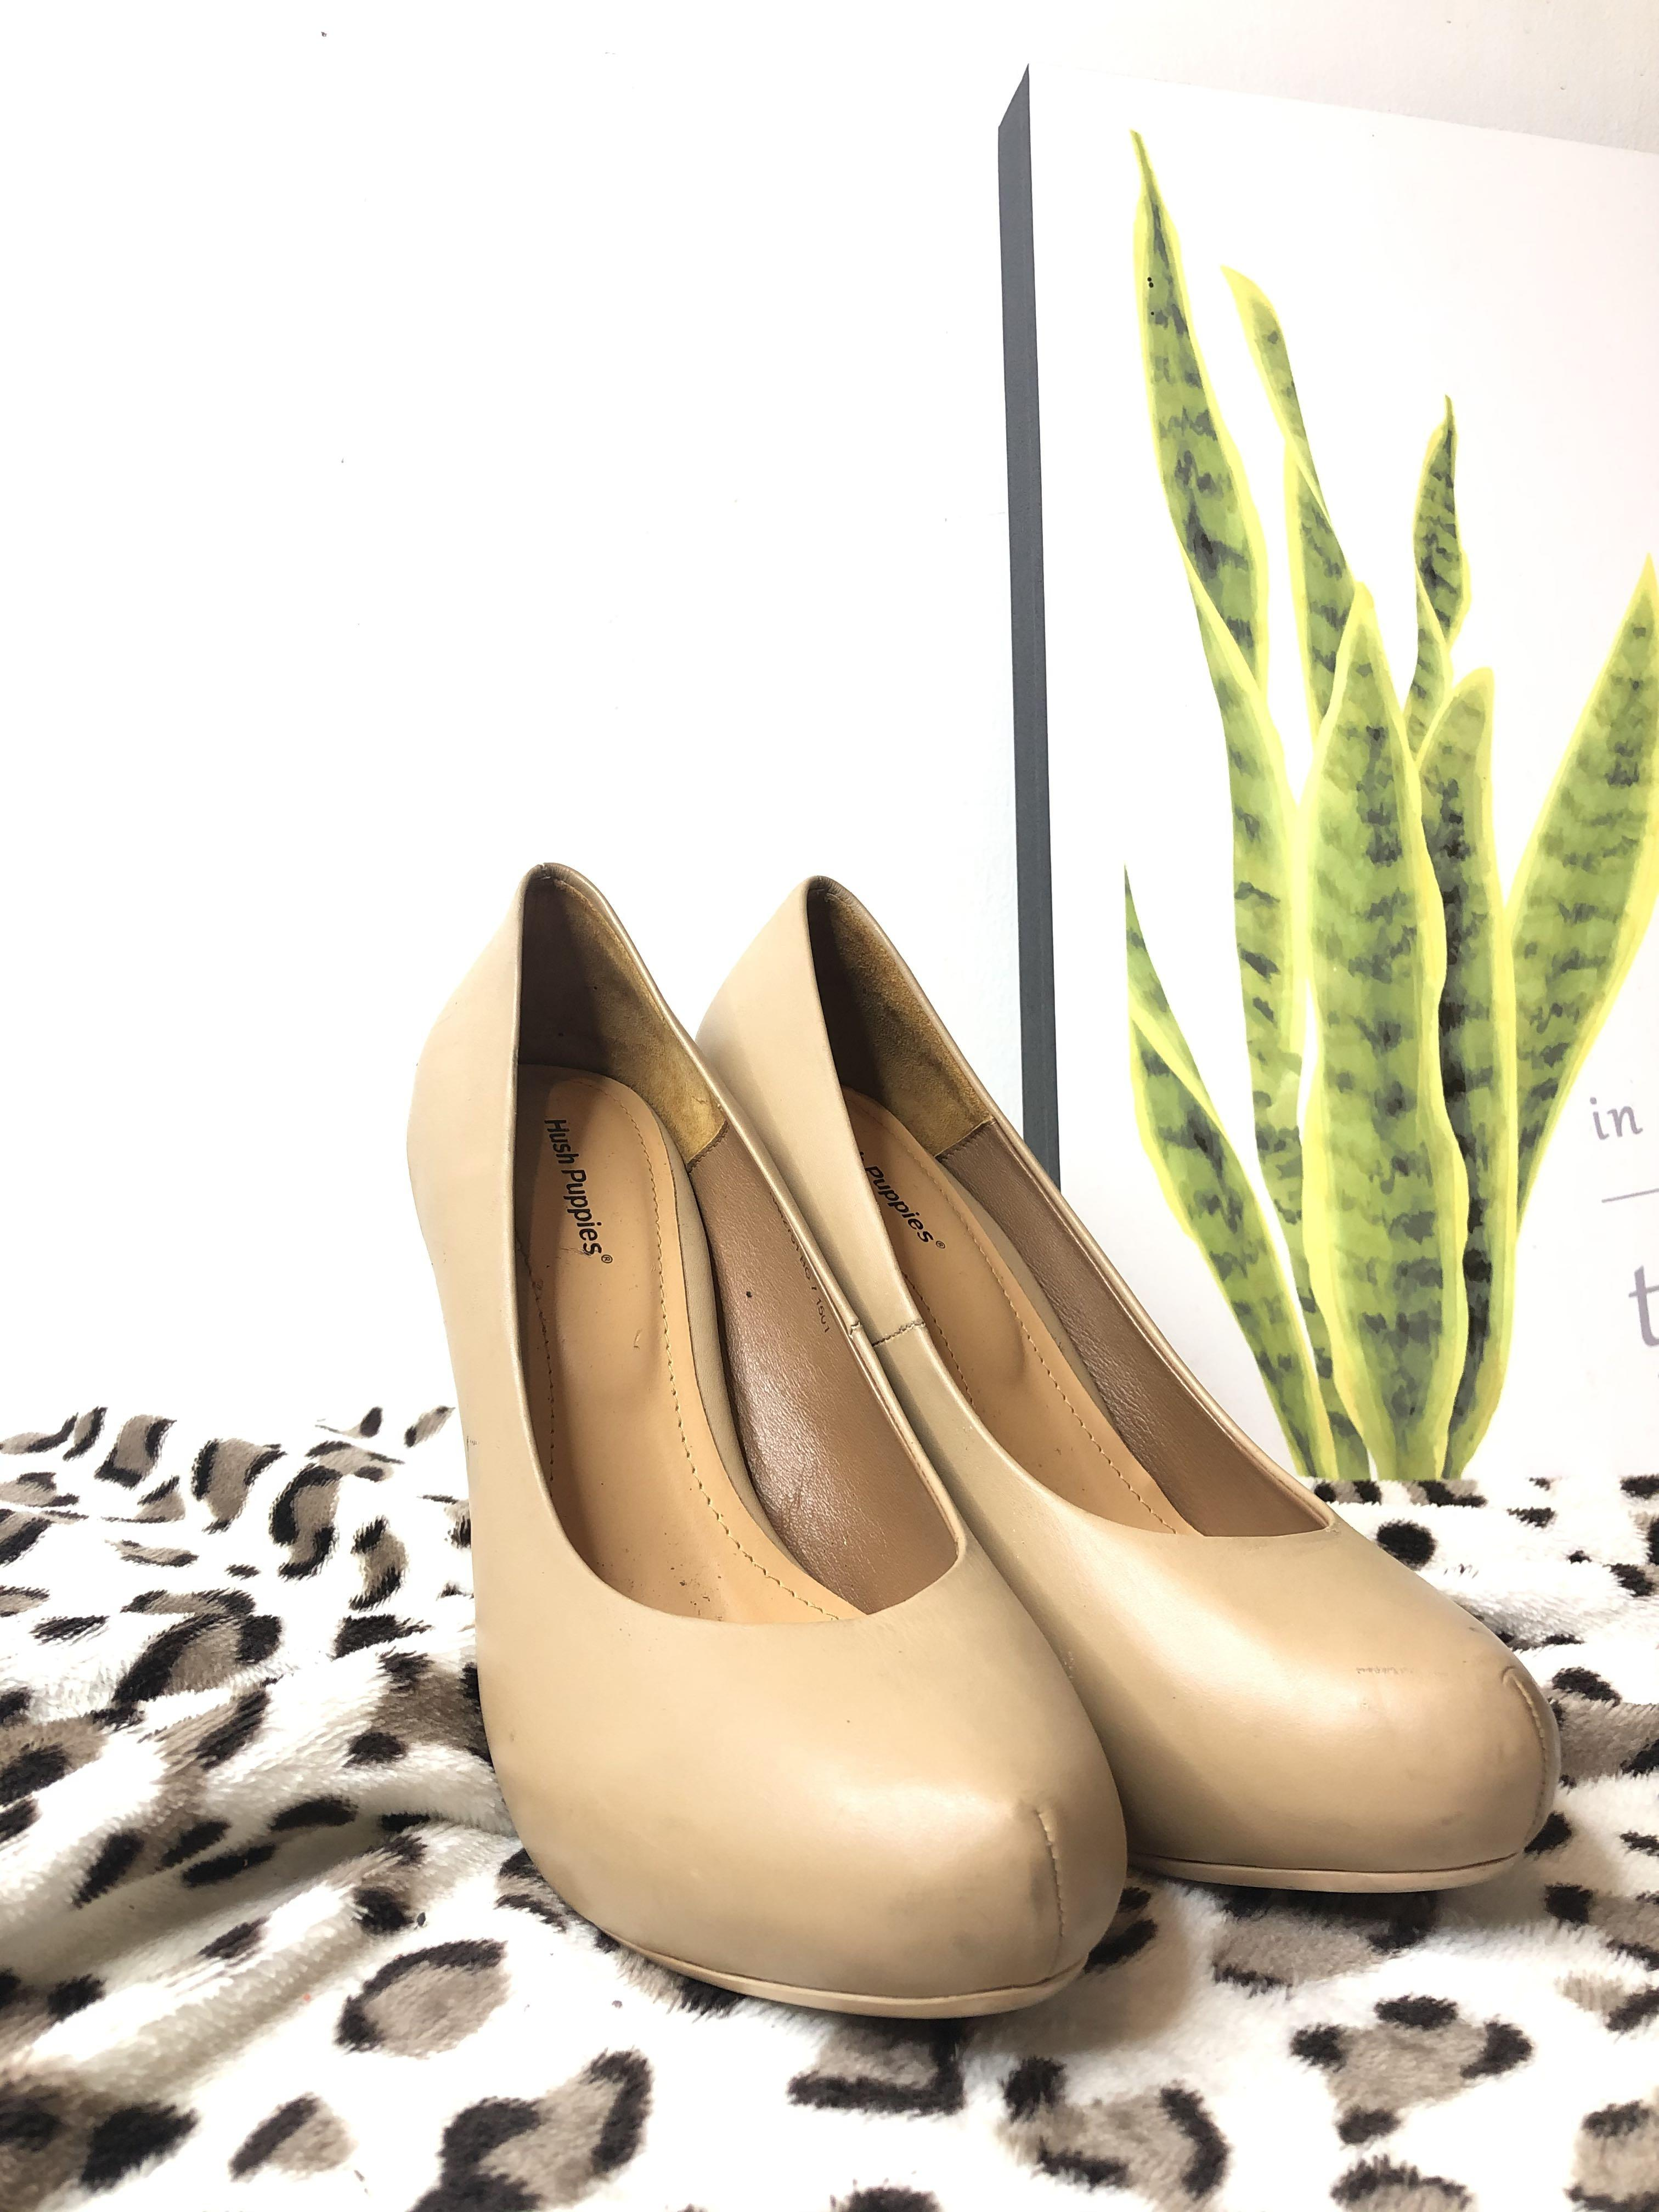 Hush Puppies Cream high heels